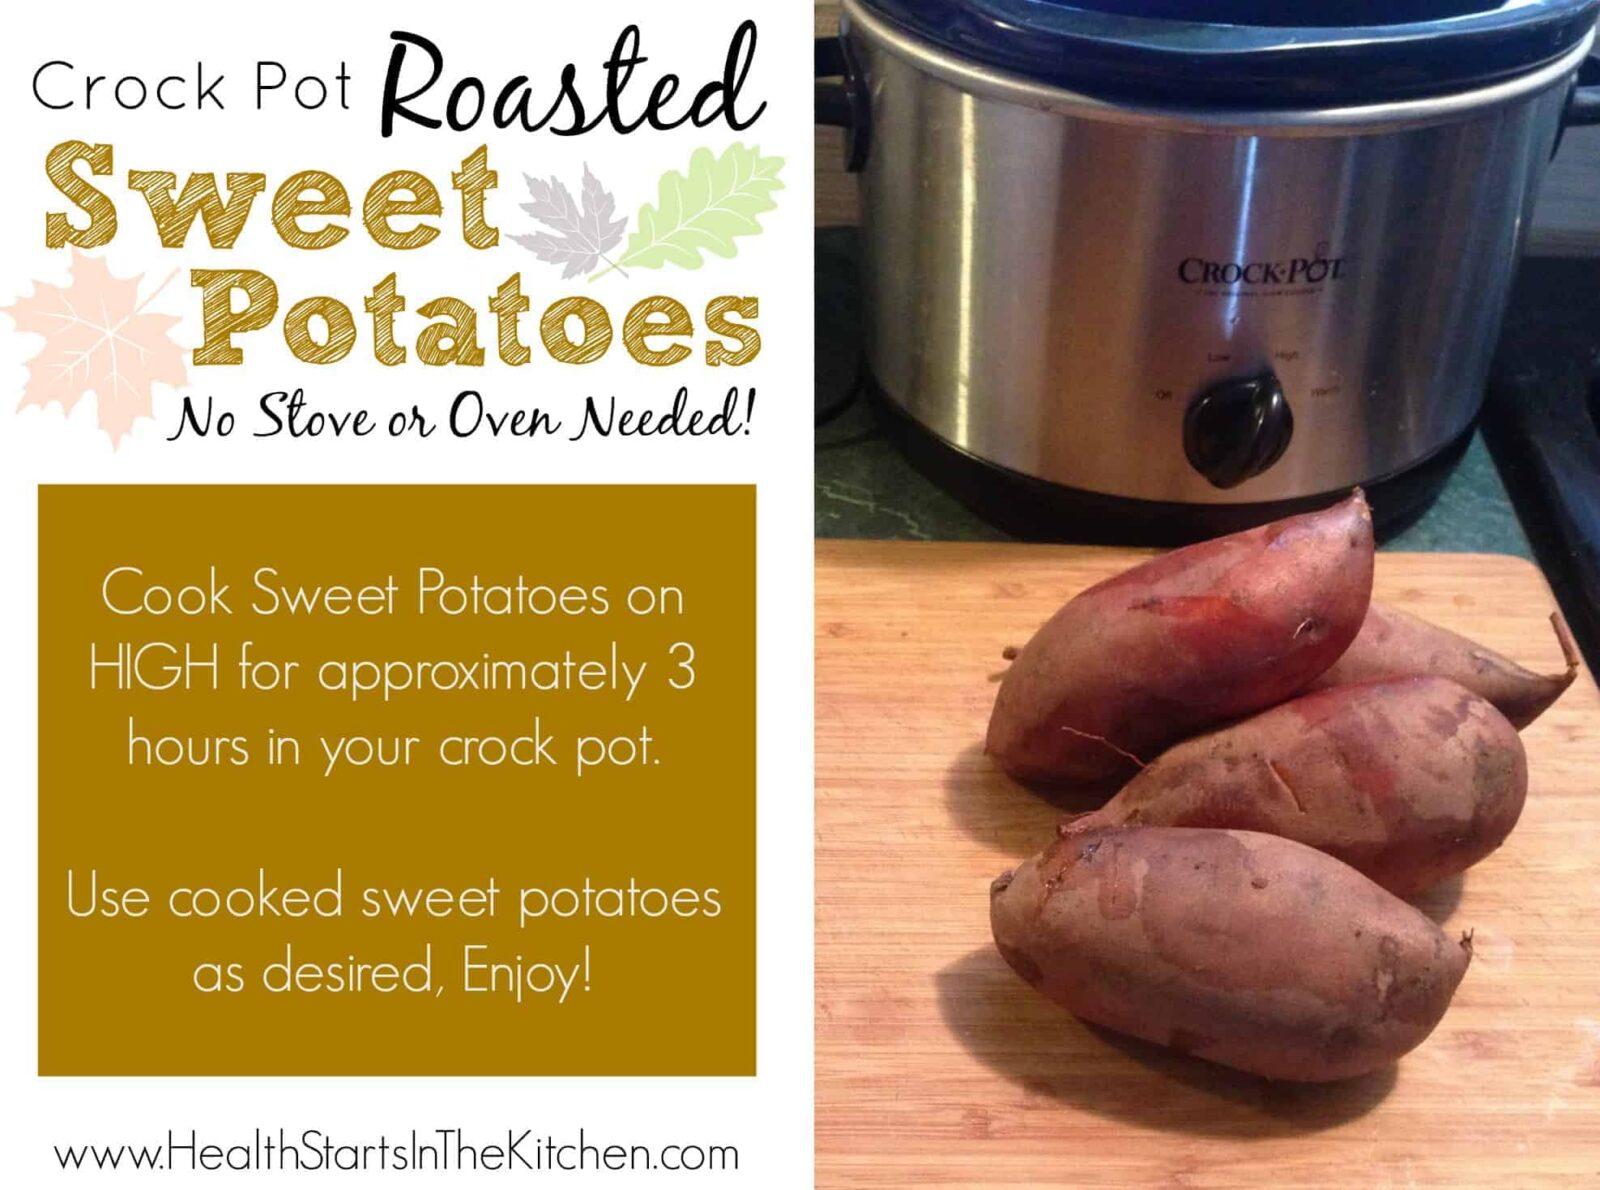 Crock Pot Roasted Sweet Potatoes